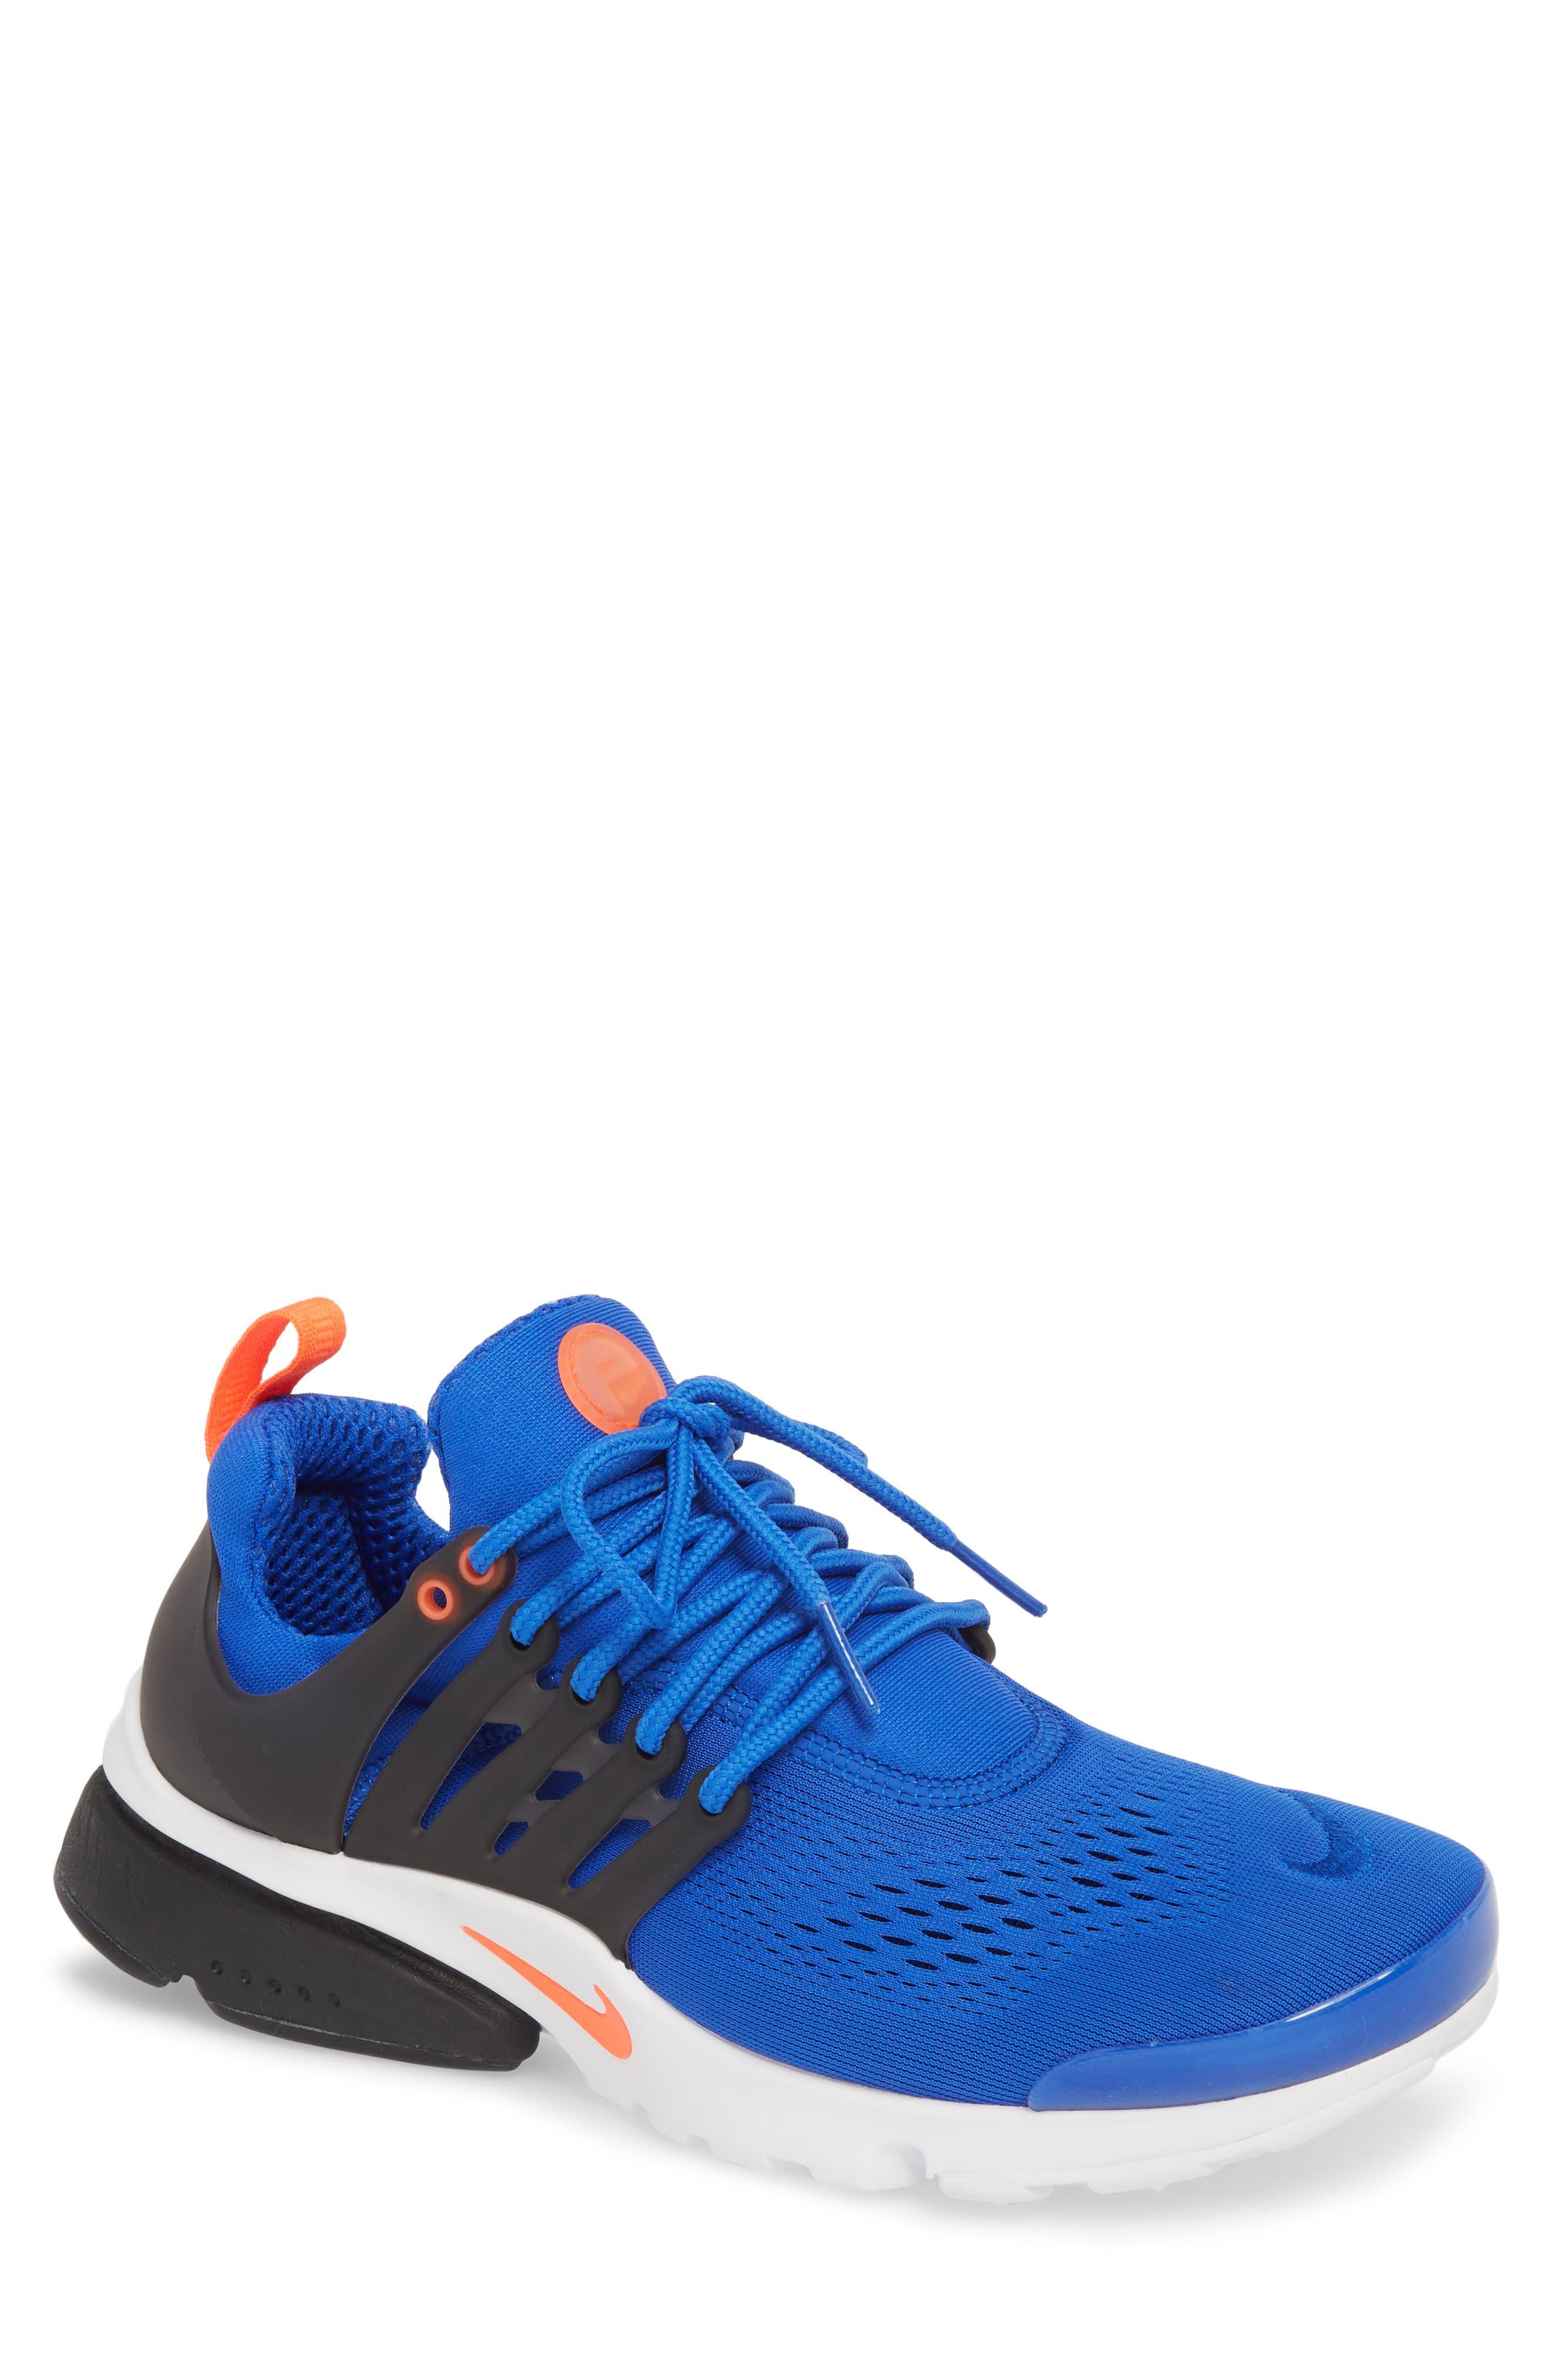 Air Presto Ultra Breathe Sneaker,                             Main thumbnail 1, color,                             Racer Blue/ Total Crimson